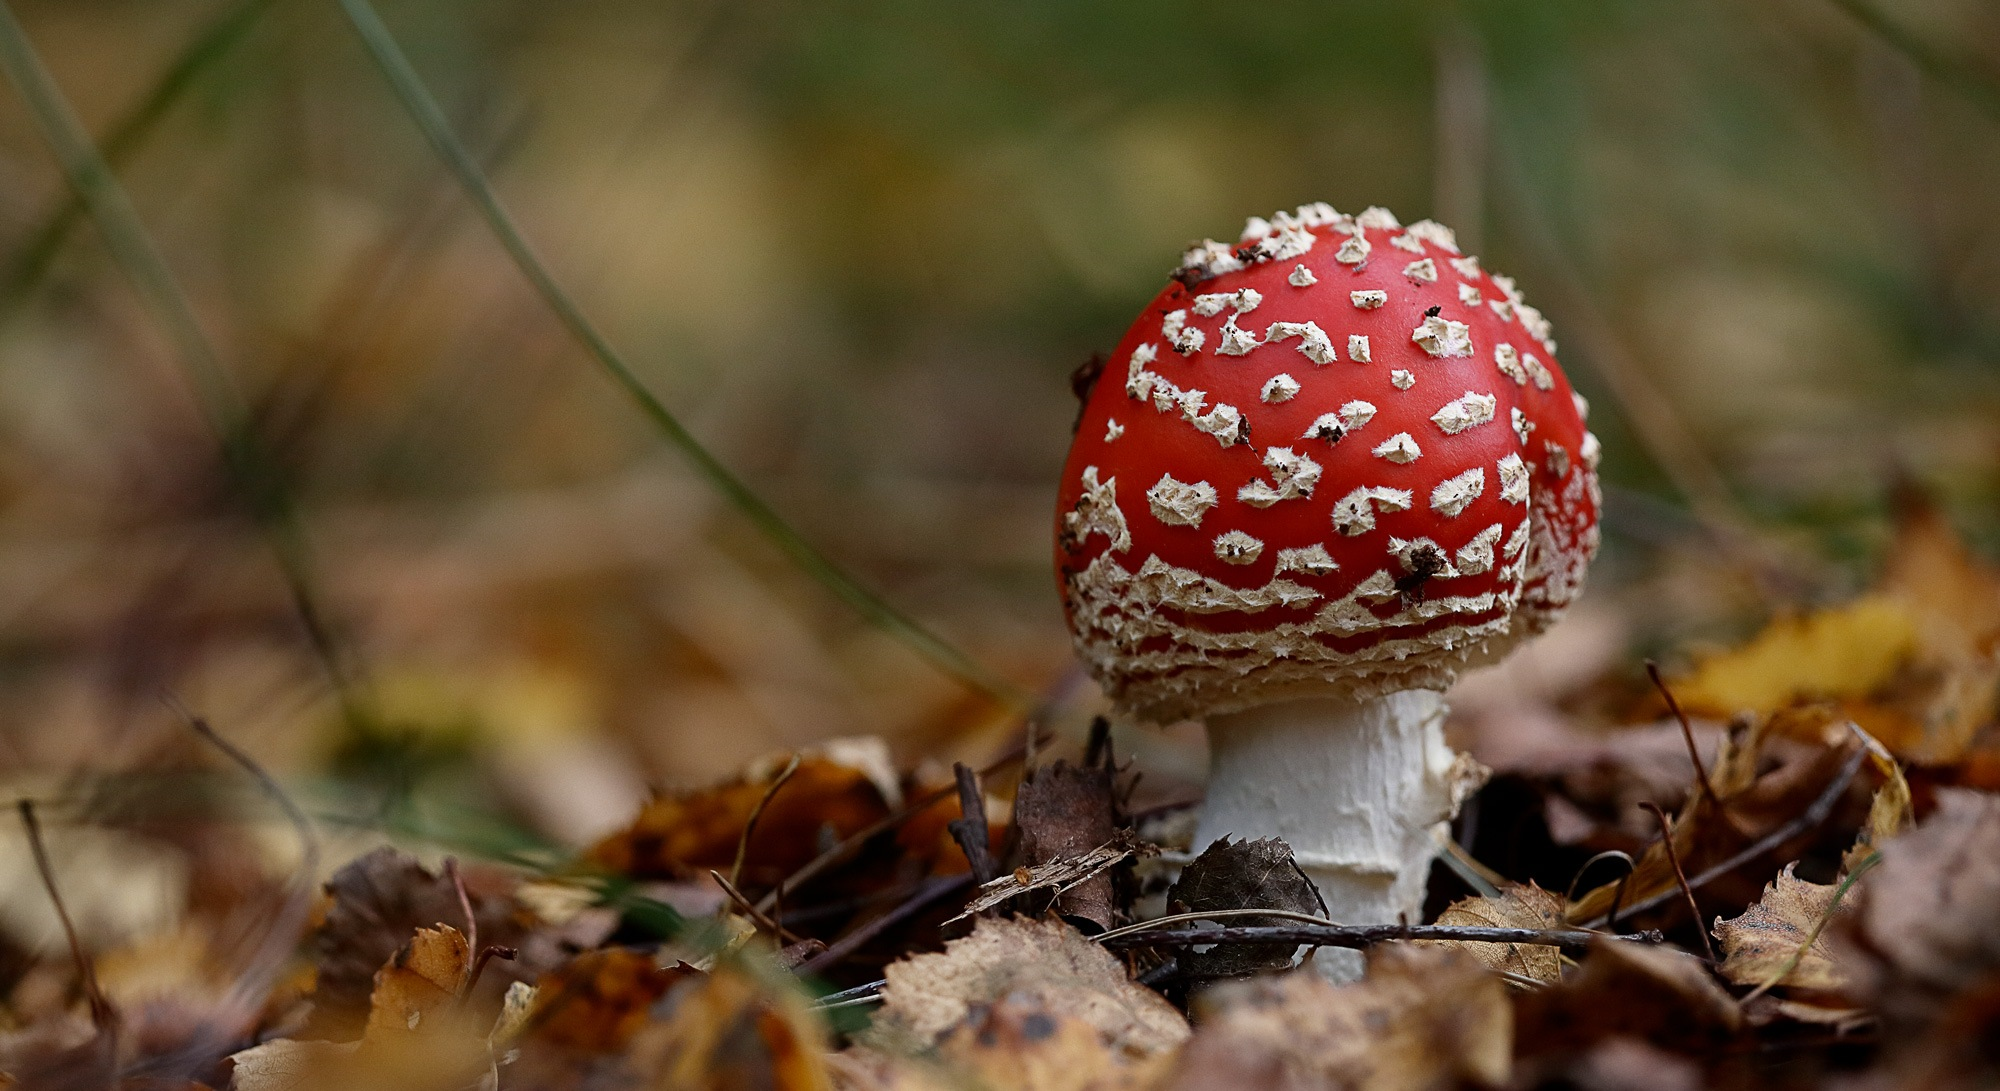 Fly agaric Mushroom by John Erwood